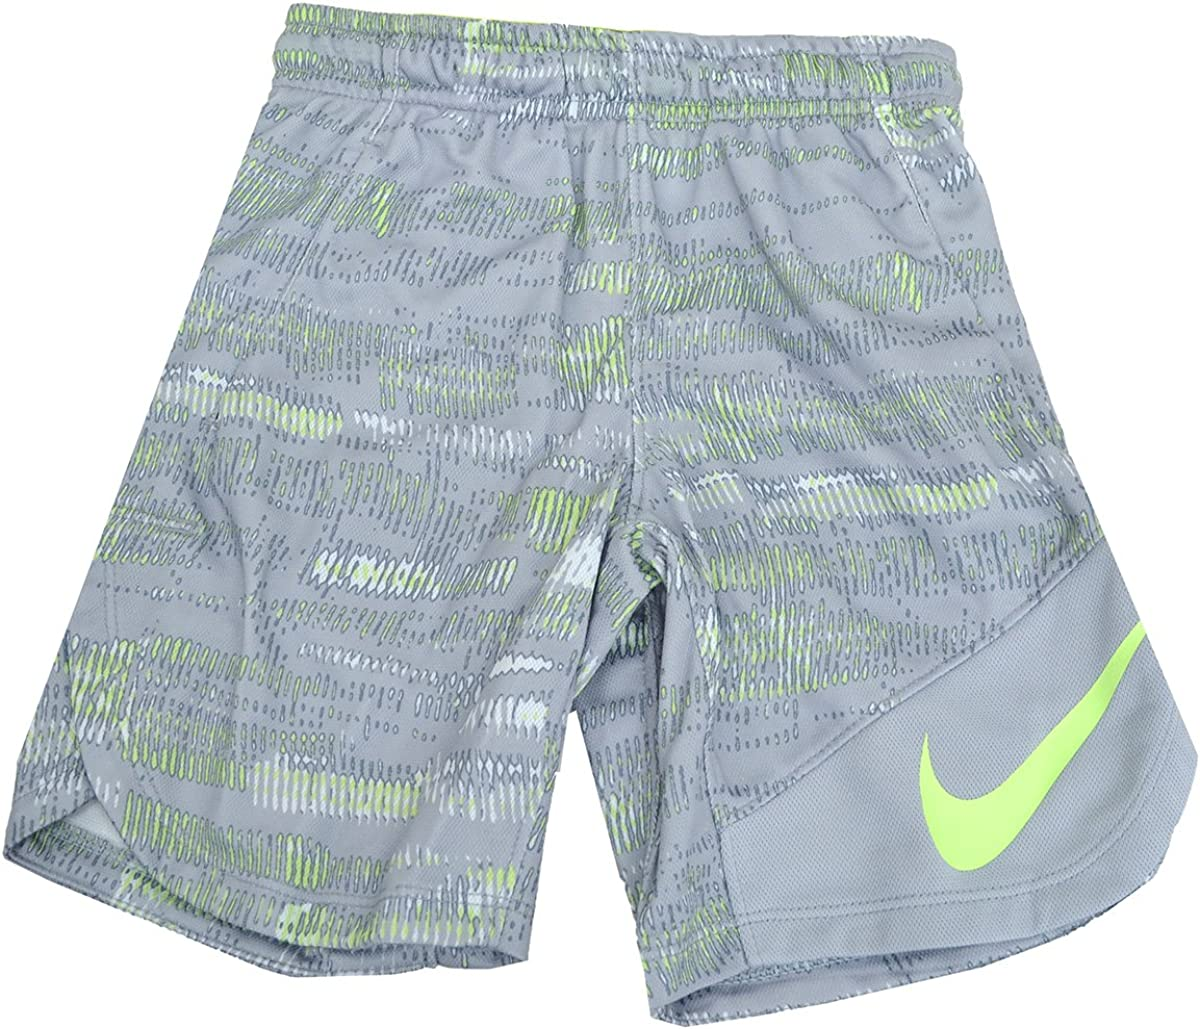 Nike Dri-FIT Vent Printed Shorts Little Boys Shorts Ghost Green Grey 4